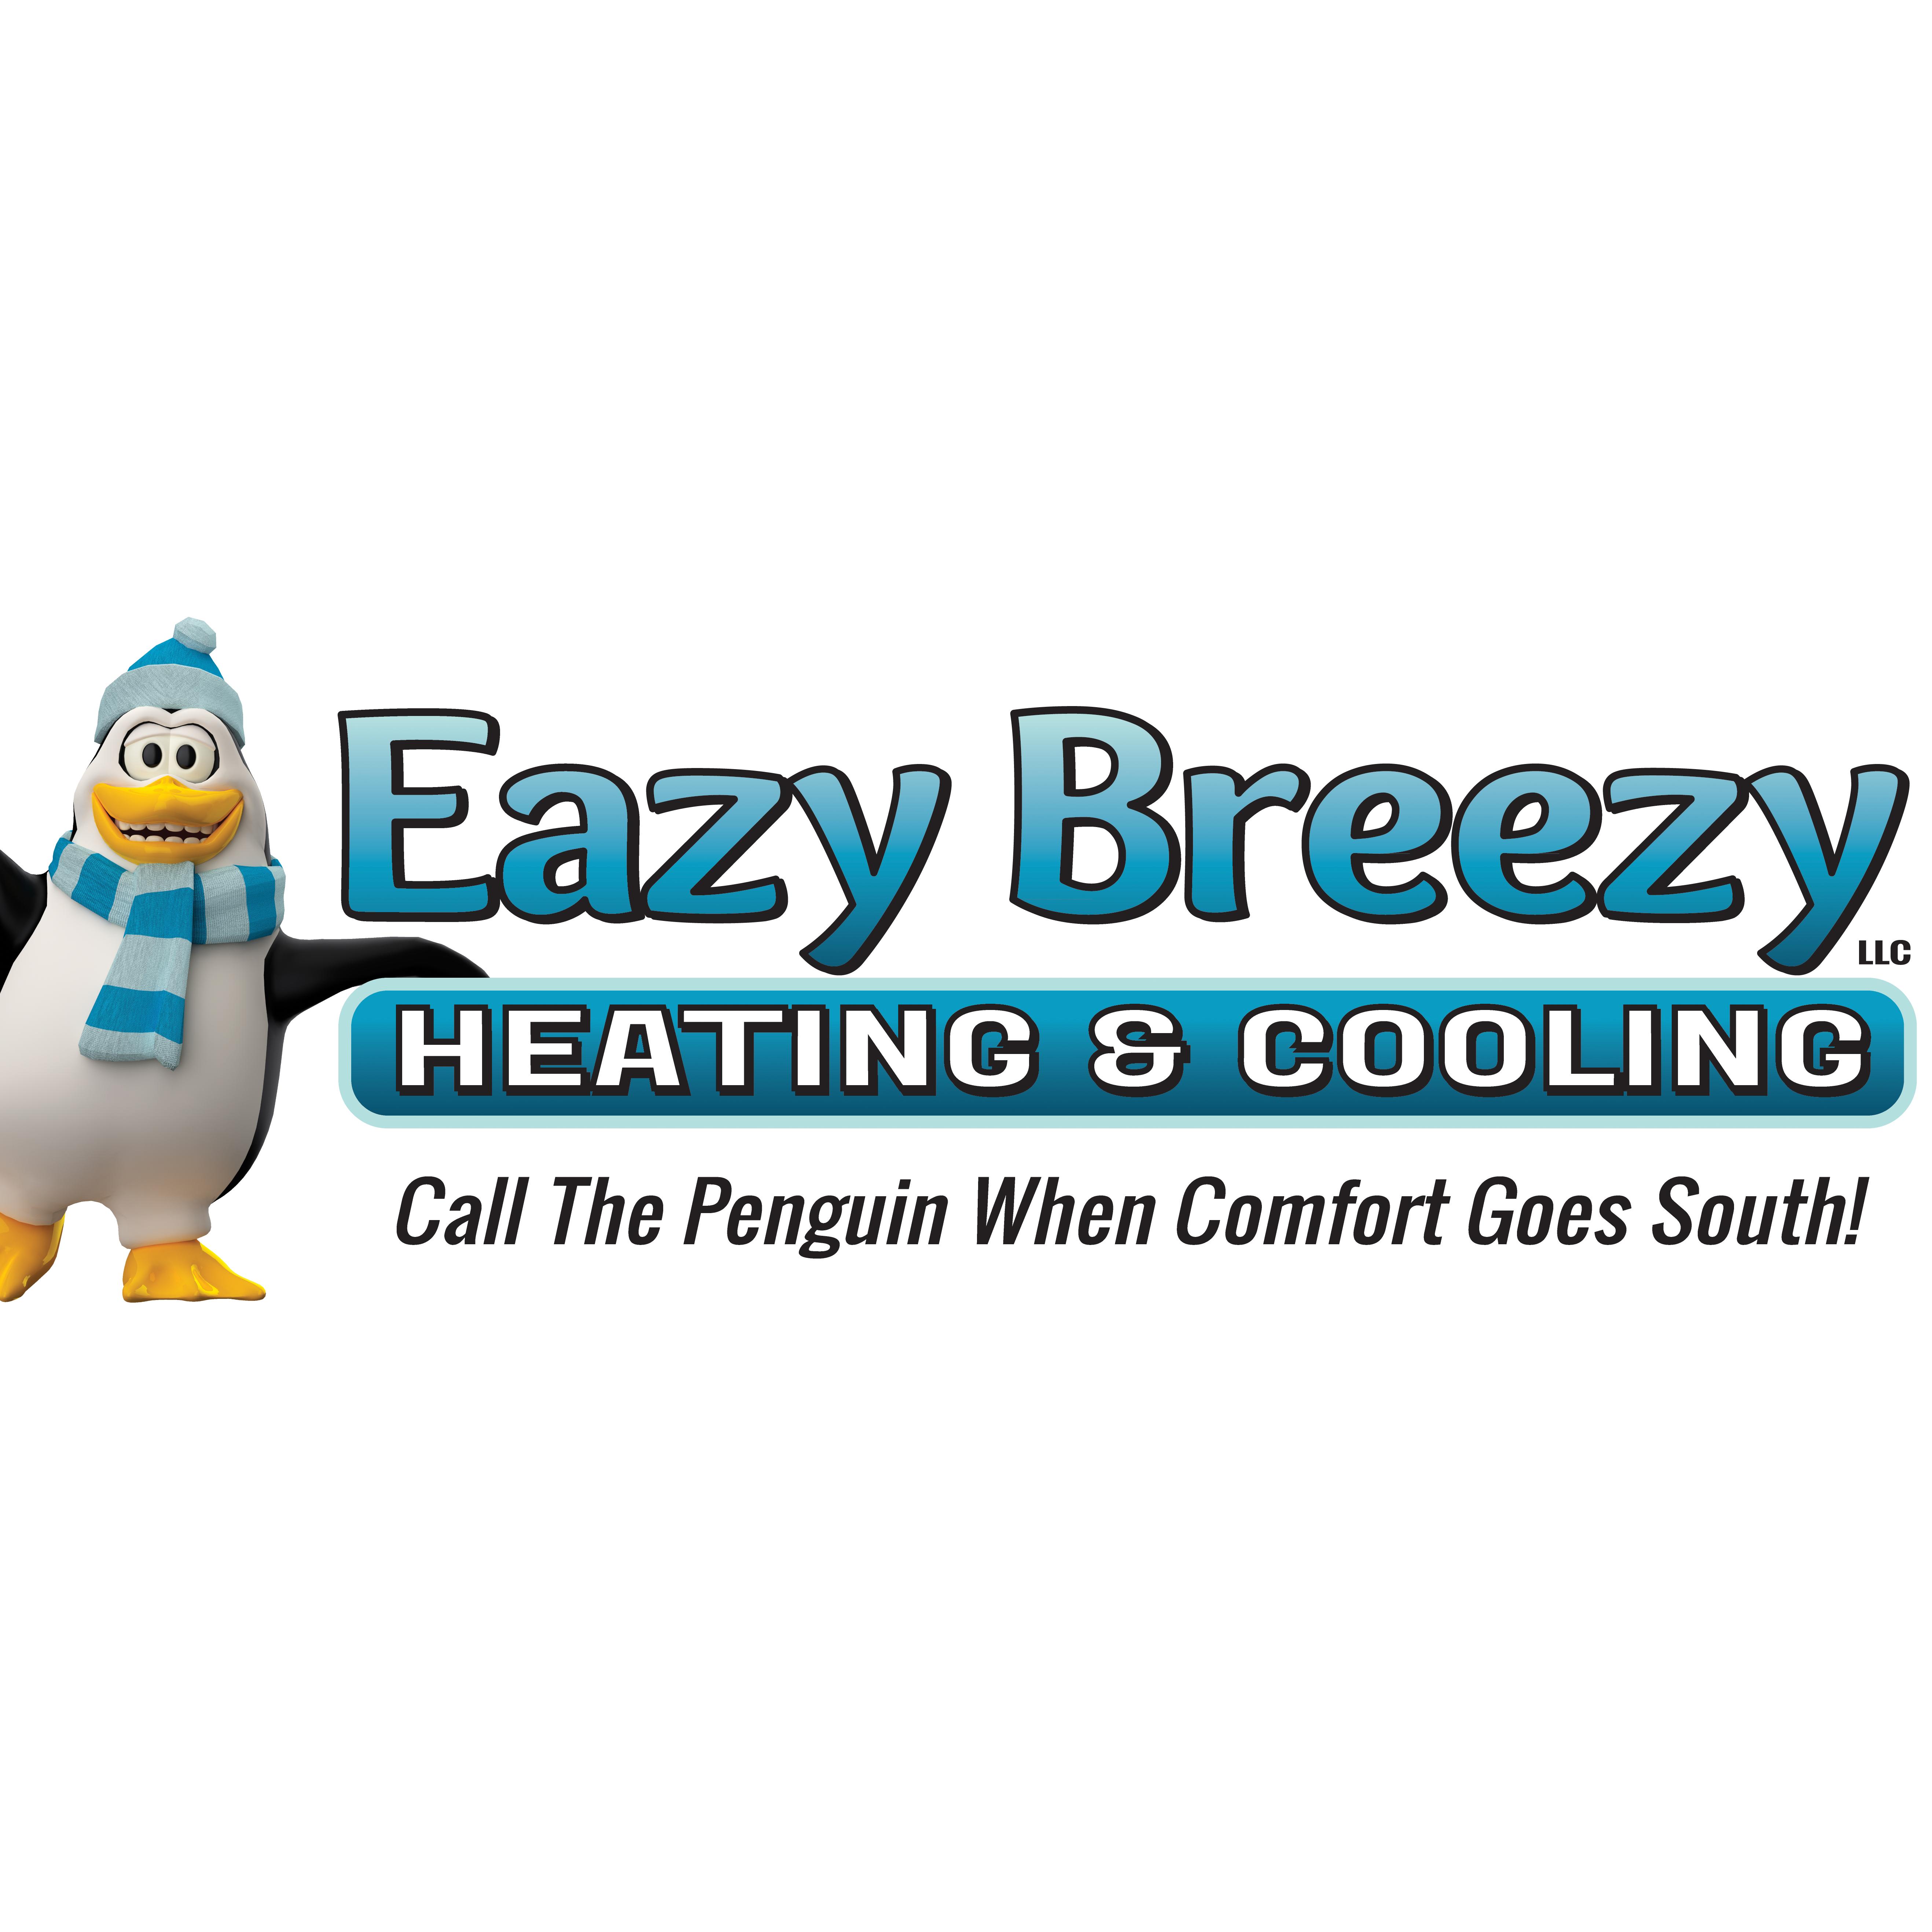 Eazy Breezy Heating & Cooling LLC